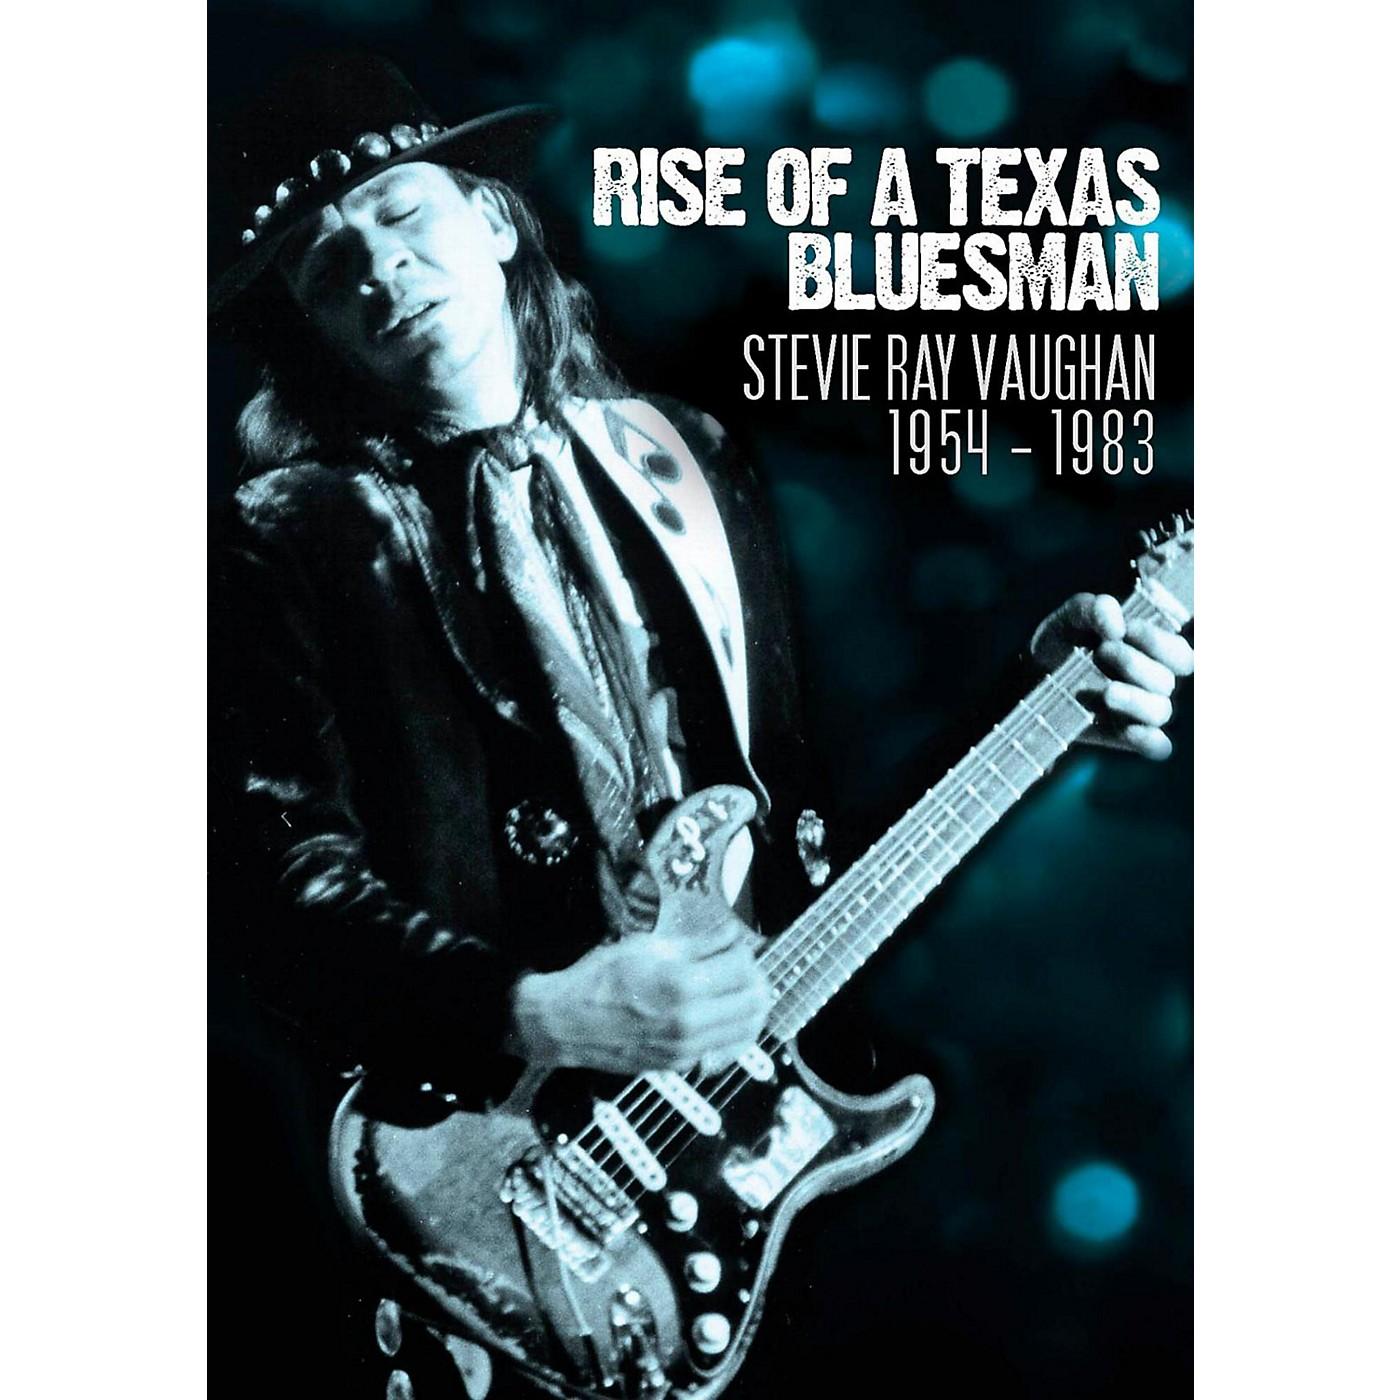 Hal Leonard Stevie Ray Vaughan - Rise Of A Texas Bluesman: 1954-1983 Live & Documentary DVD thumbnail